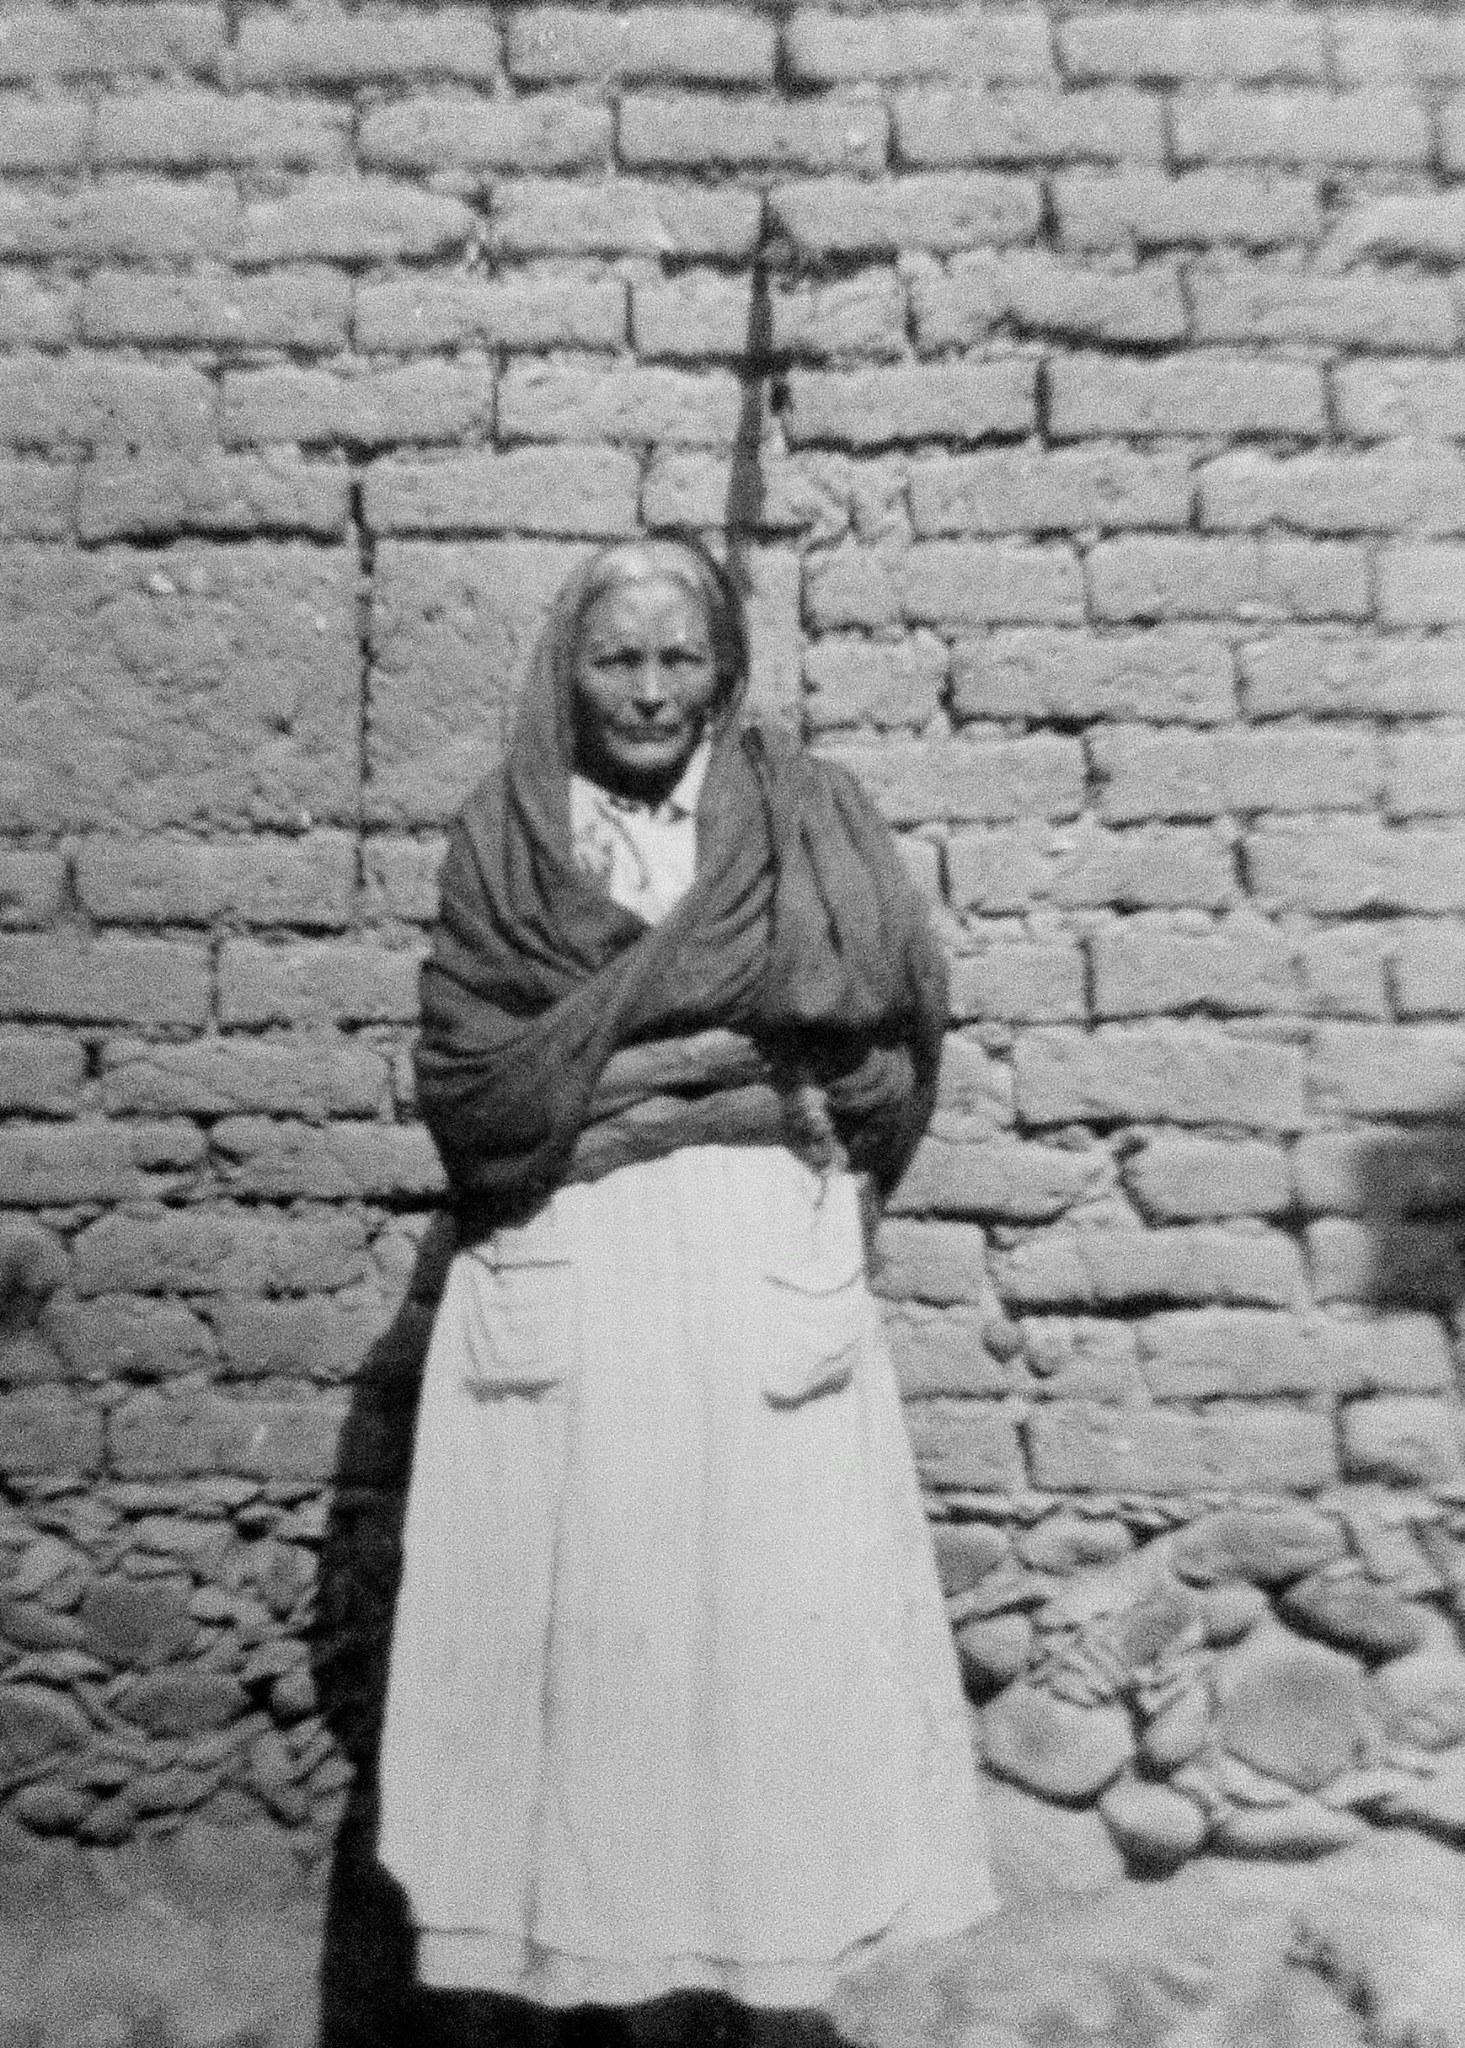 My great, great grandmother Juanita Velasquez.